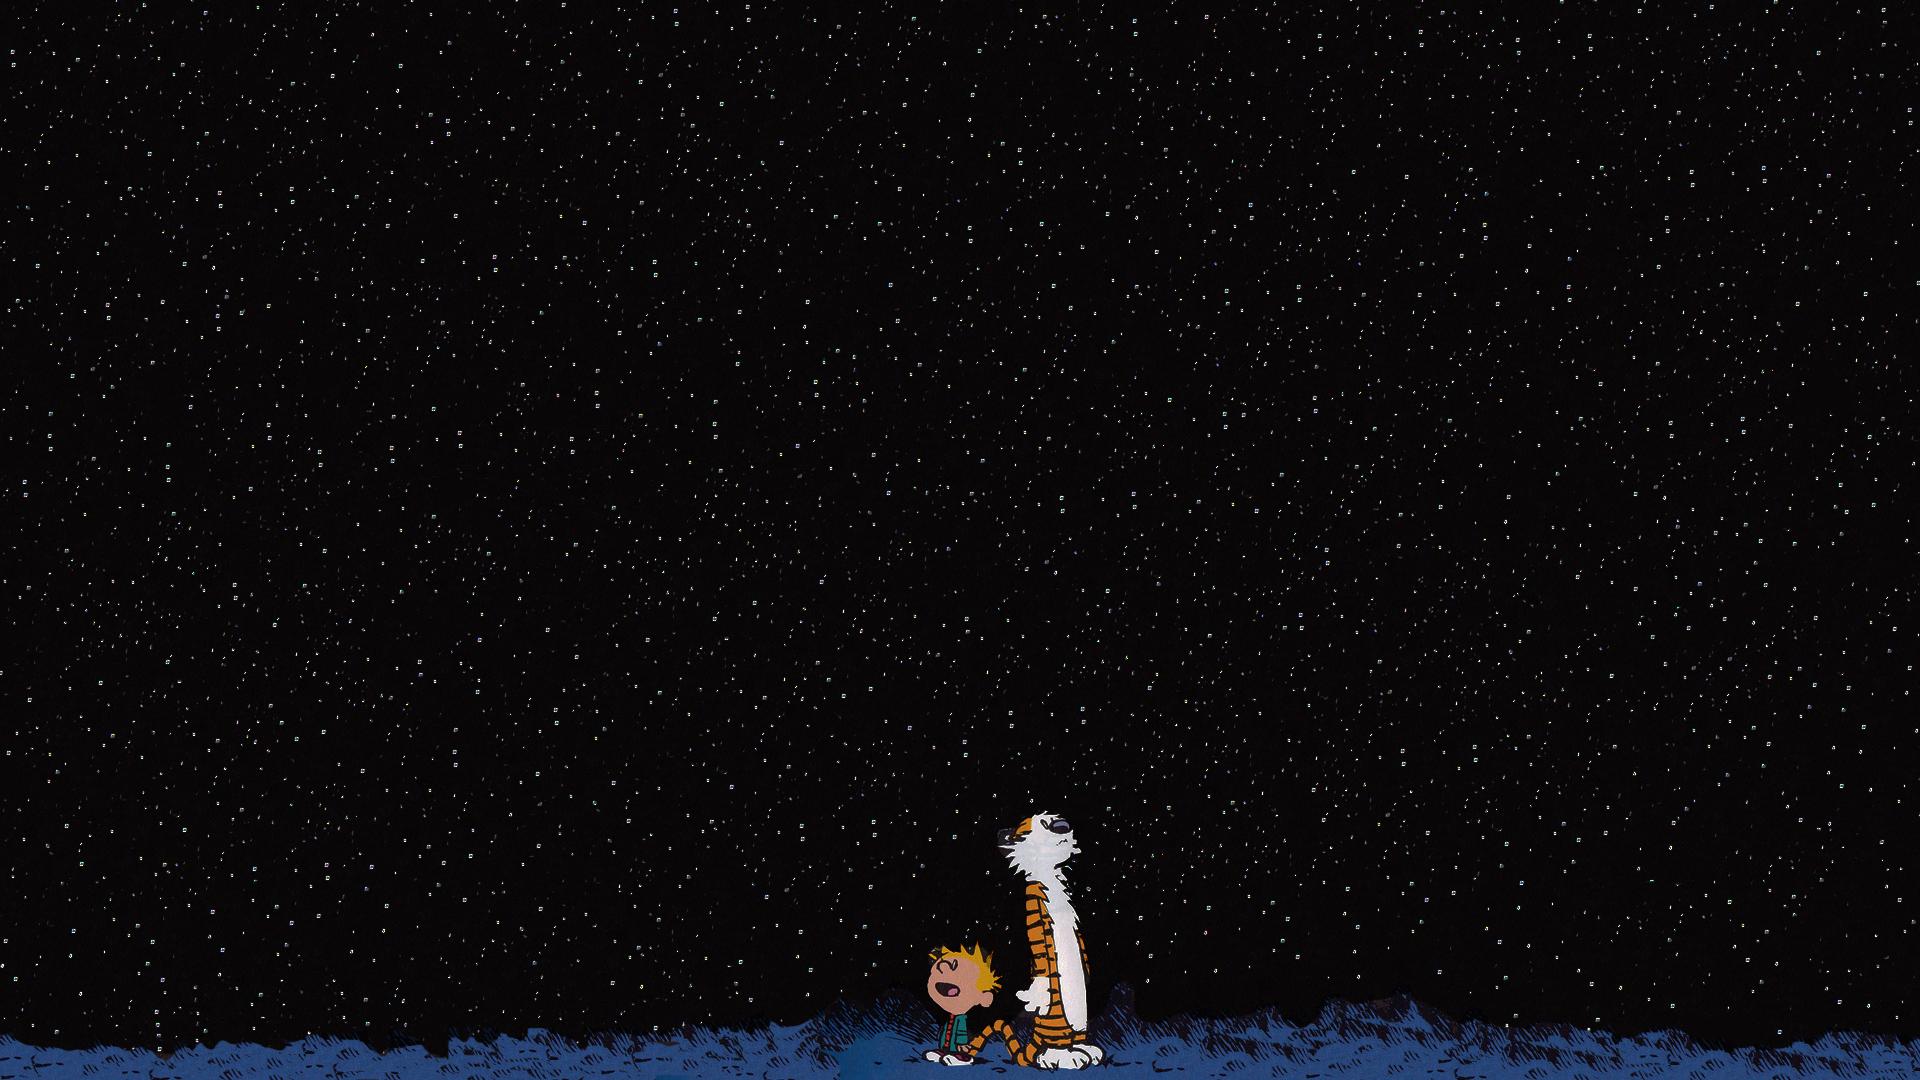 space girl cartoon wallpaper - photo #44